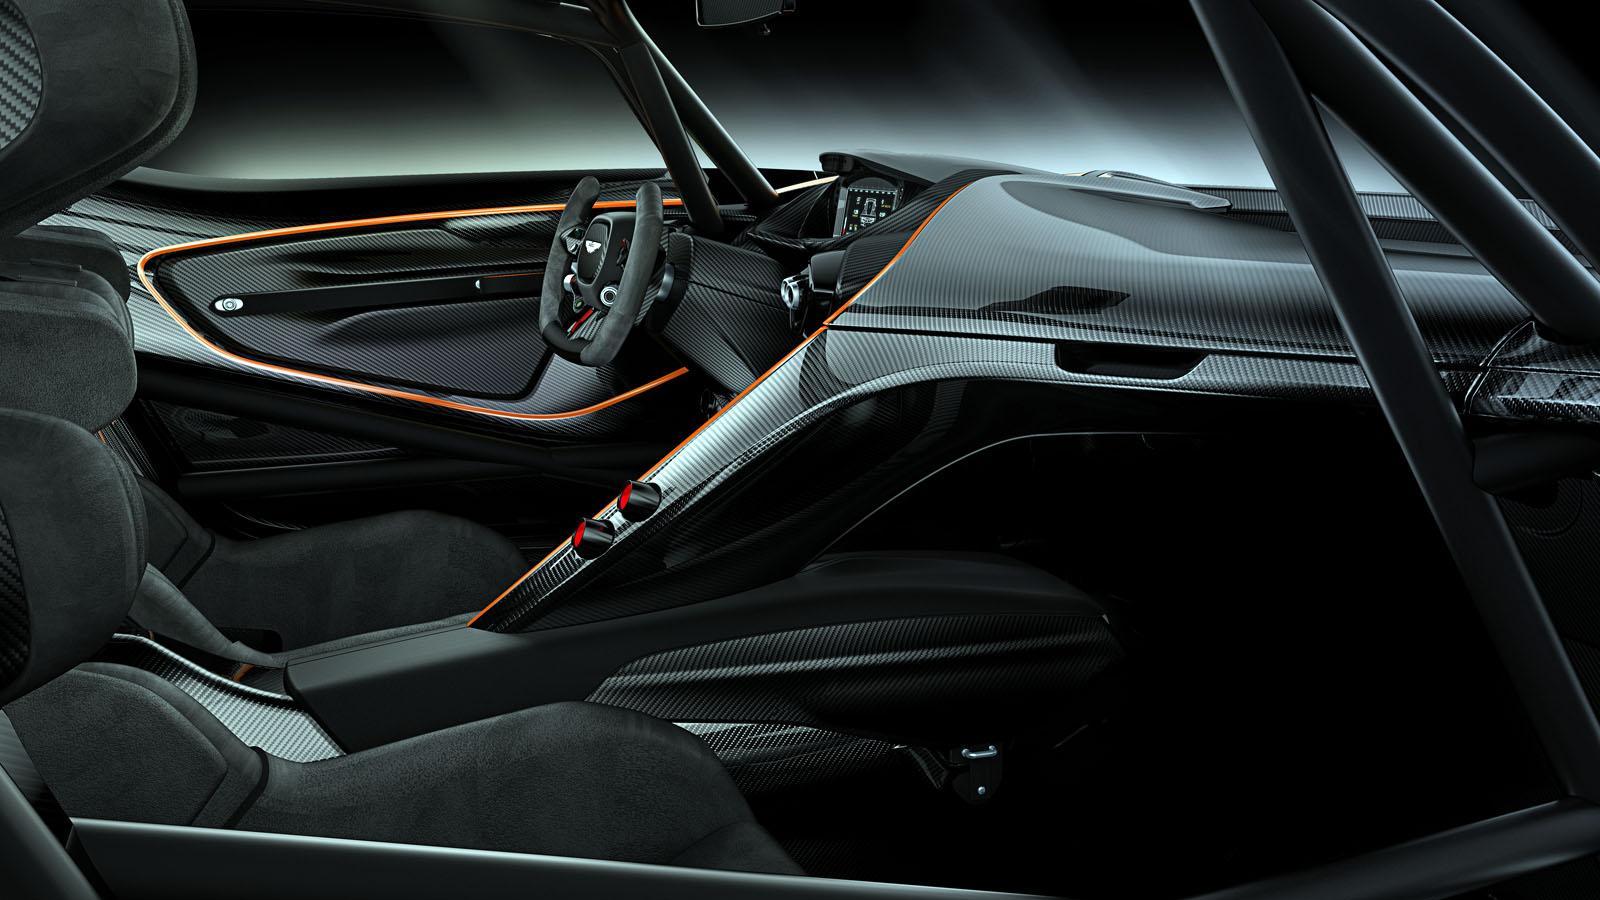 Aston Martin Vulcan Cockpit